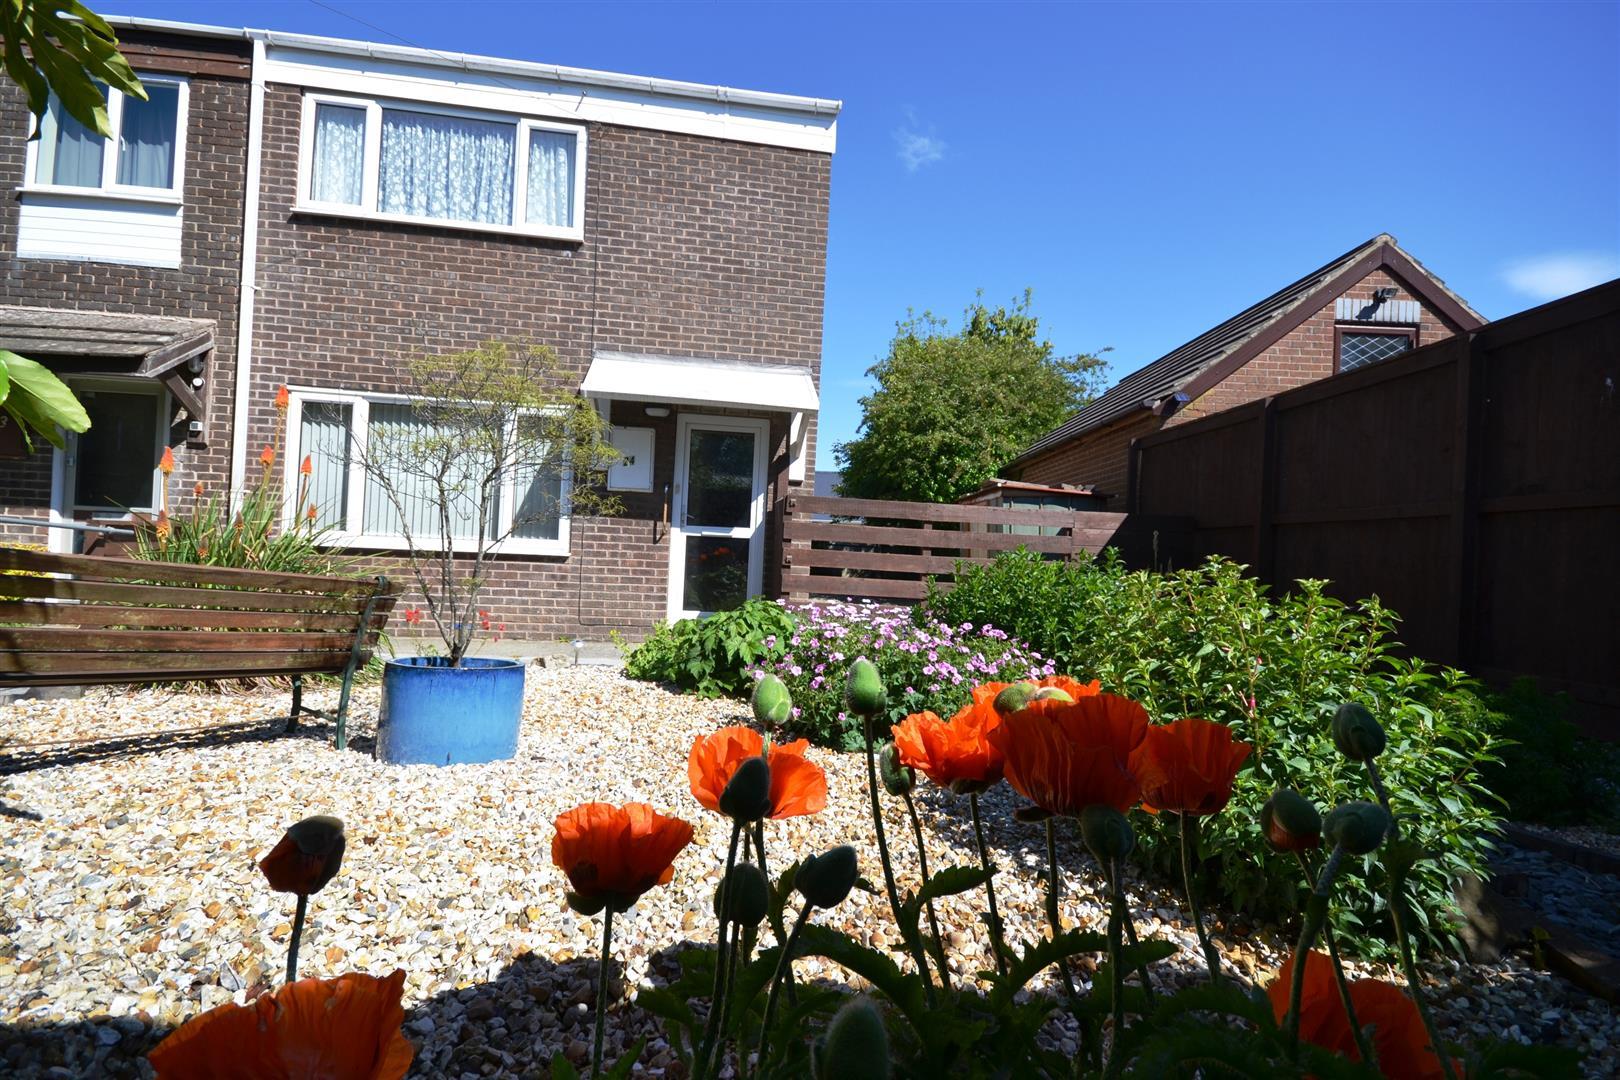 Haverfordwest, SA61